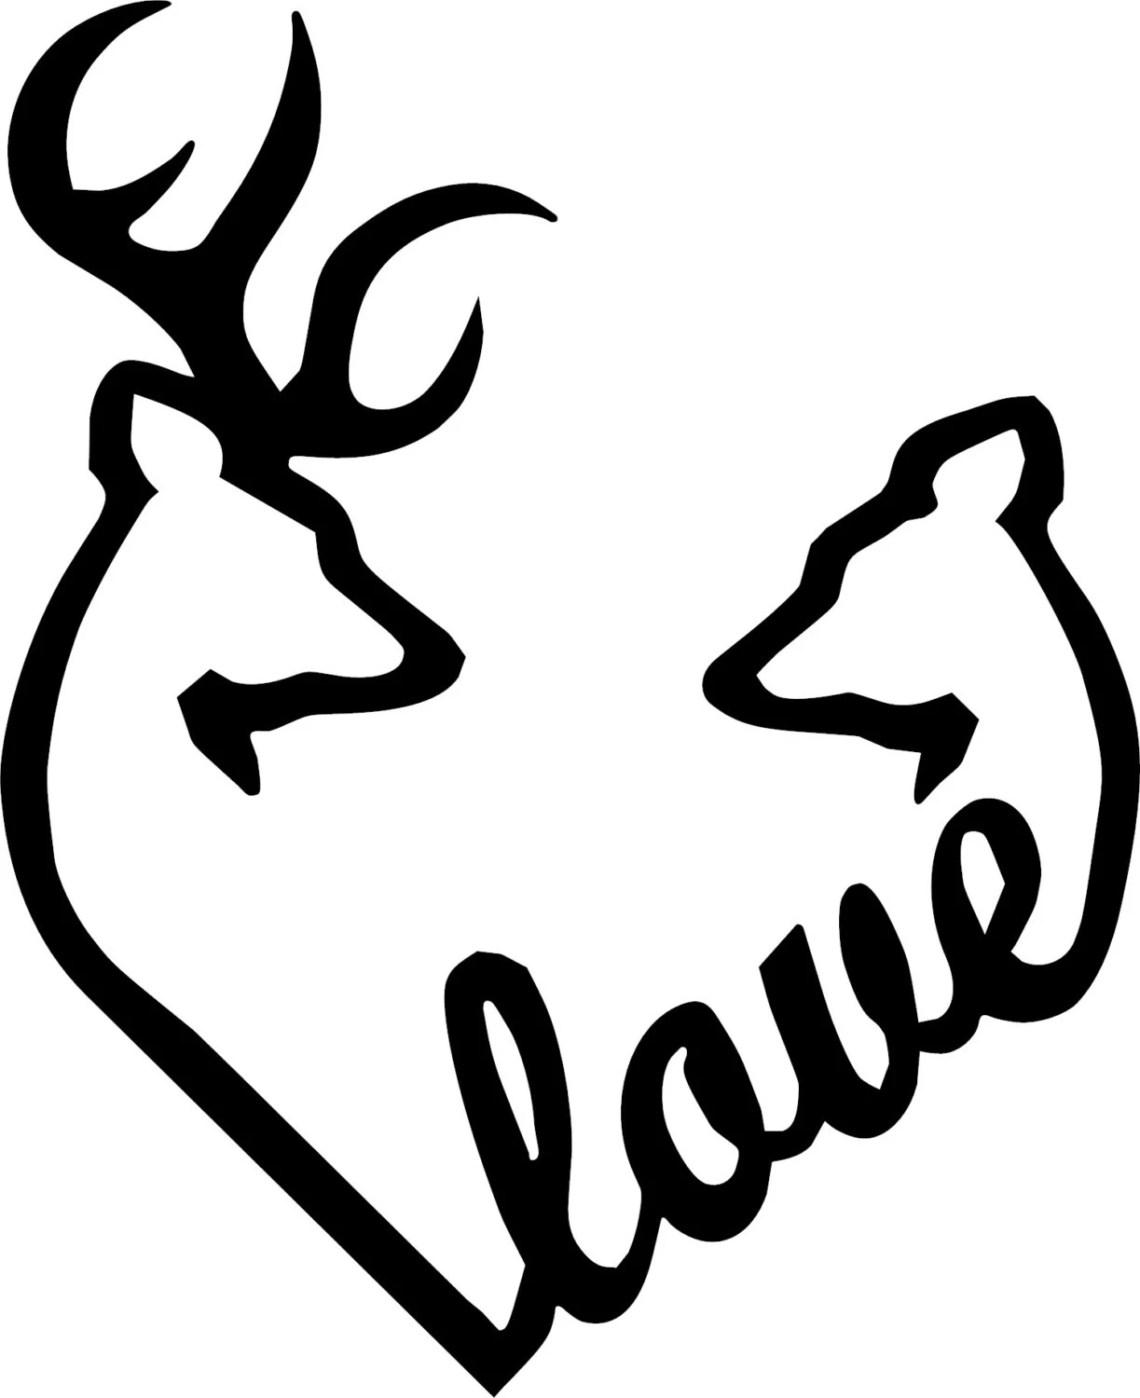 Download Browning Love Heart Deer Buck and Doe vinyl decal | Etsy